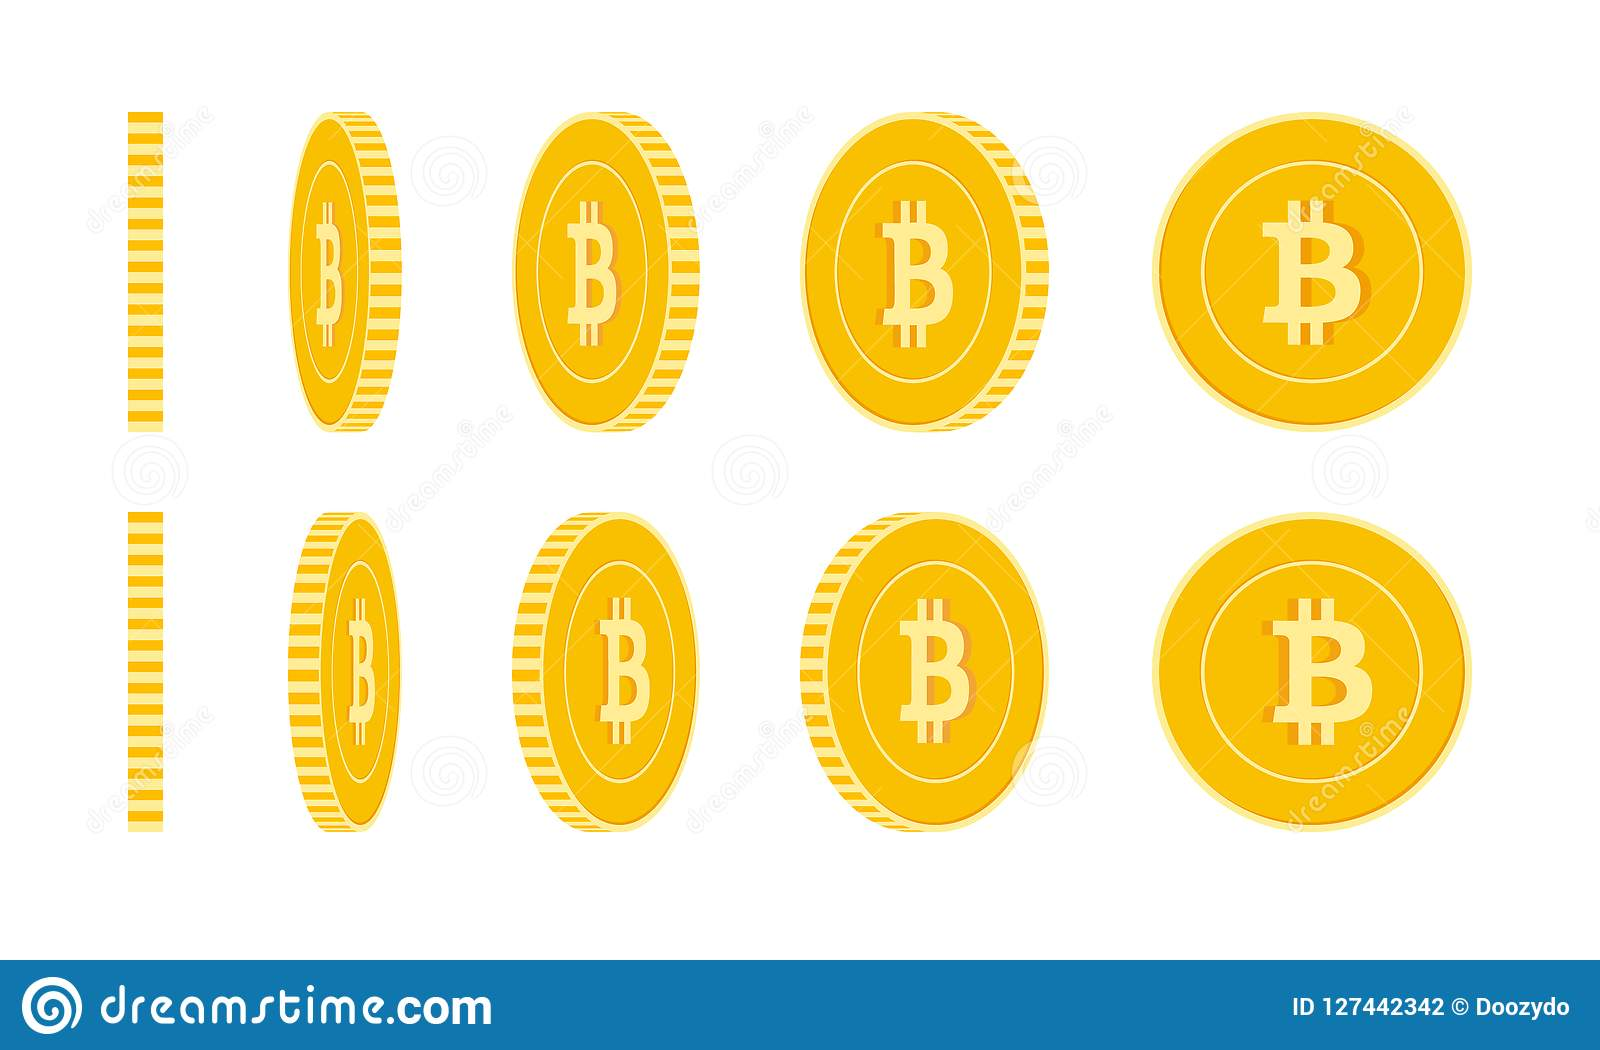 bitcoin rotatie rotator rotativ